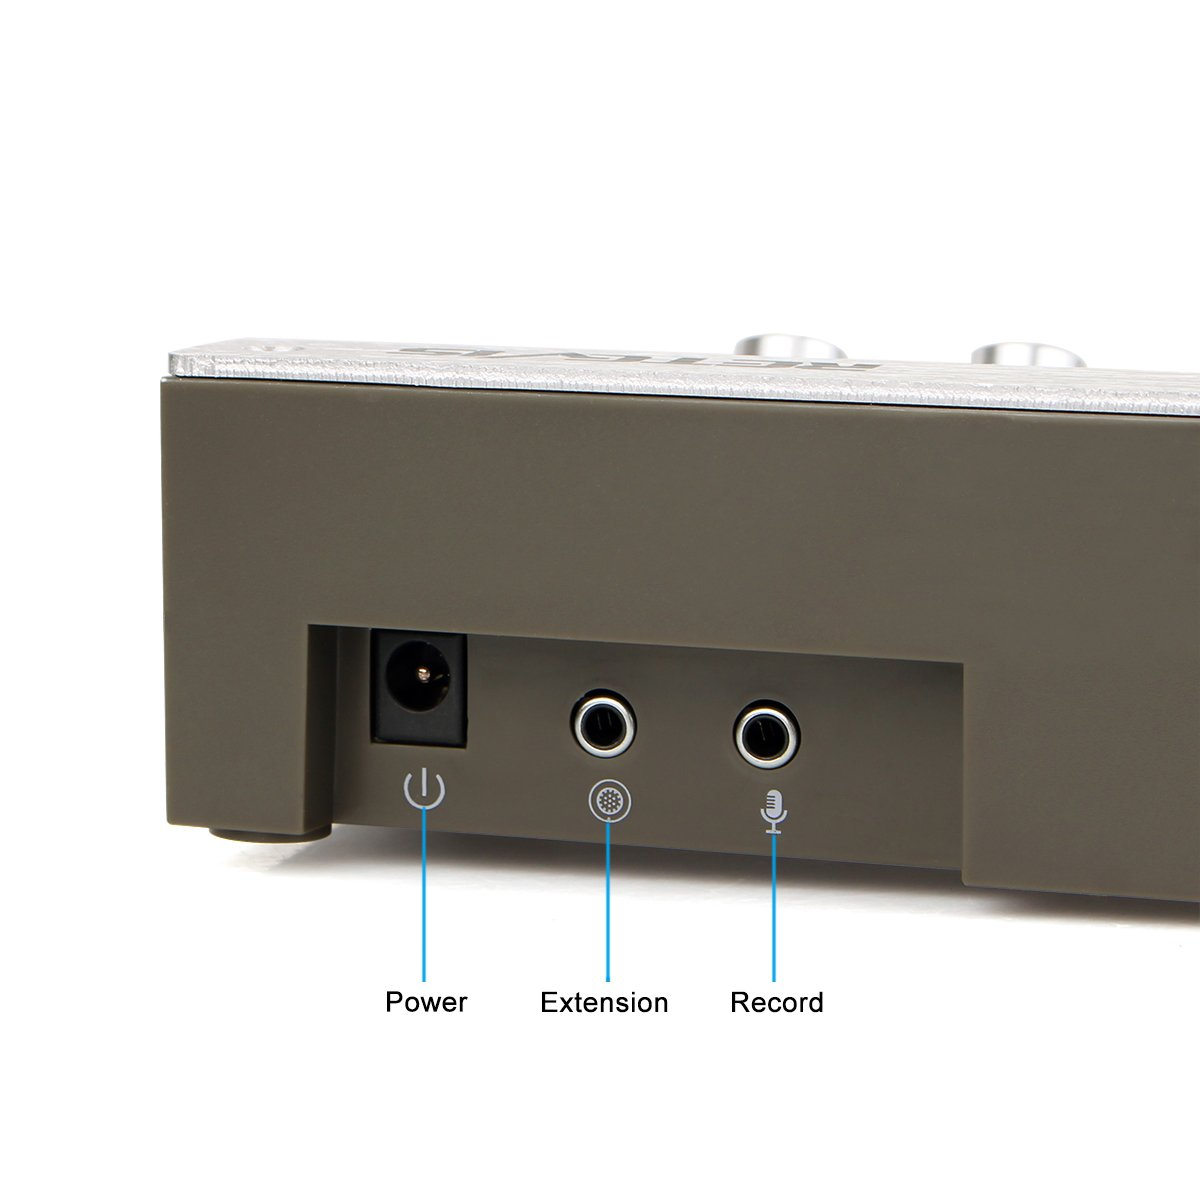 Retevis Rt 9908 3w Anti Interference Bank Counter Intercommunication Intercom Circuit Window System Dual Way Microphonesilver1 Pack Home